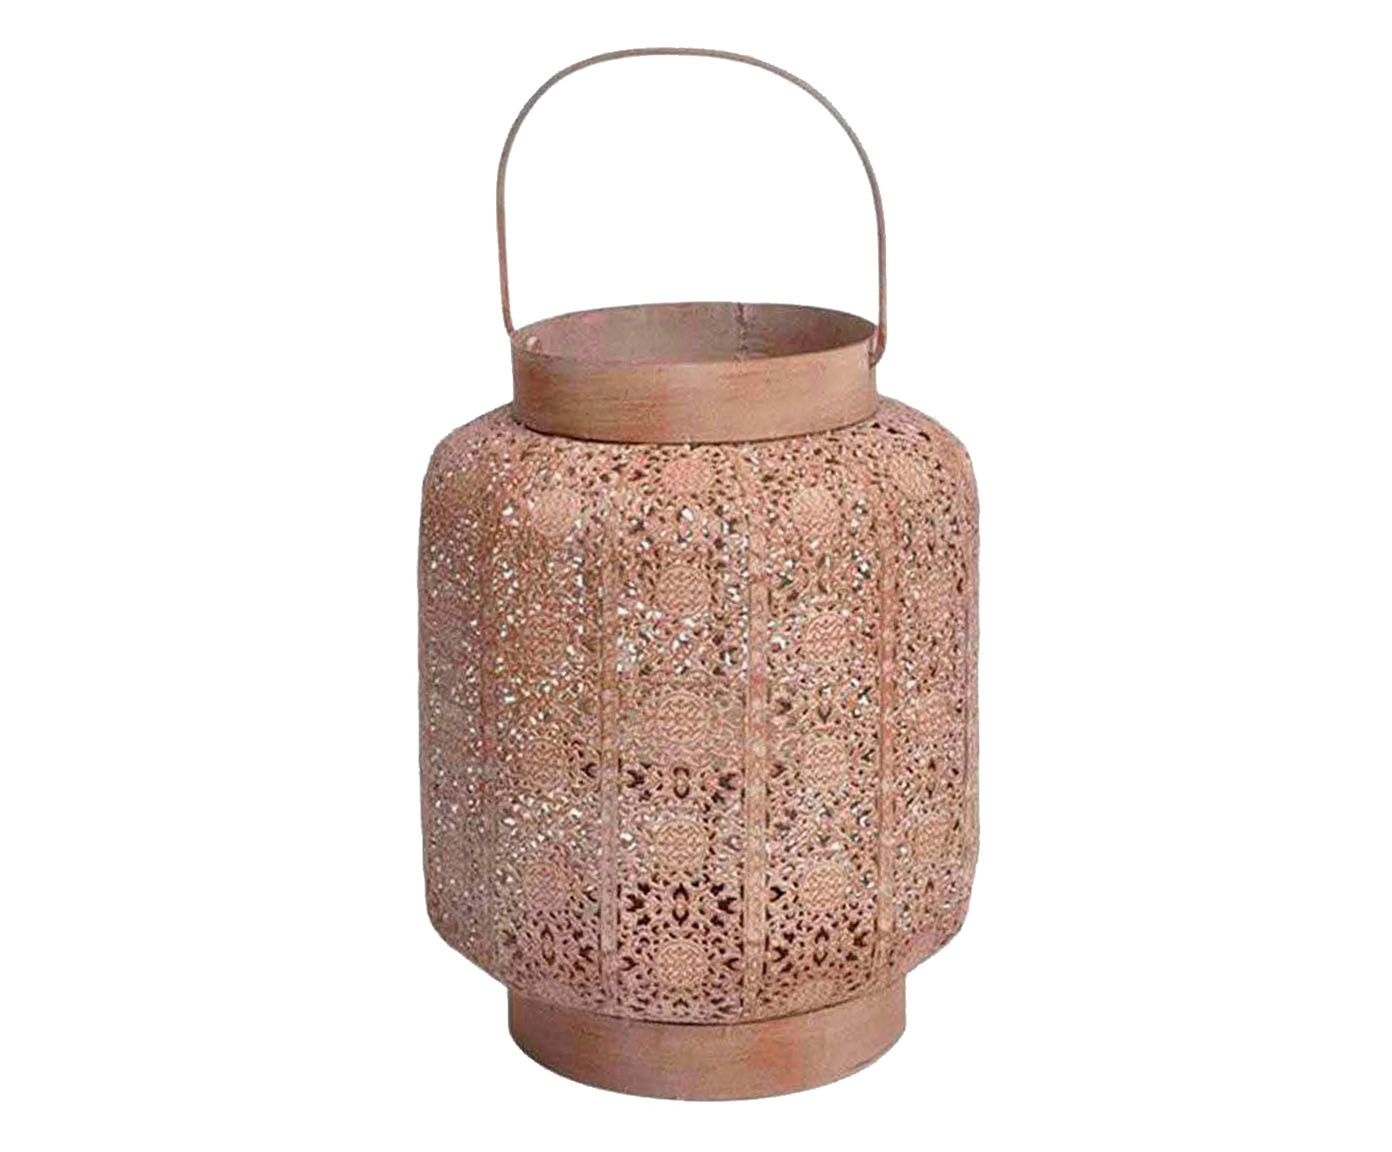 Porta-vela marrakesk - 23 x 19 cm   Westwing.com.br